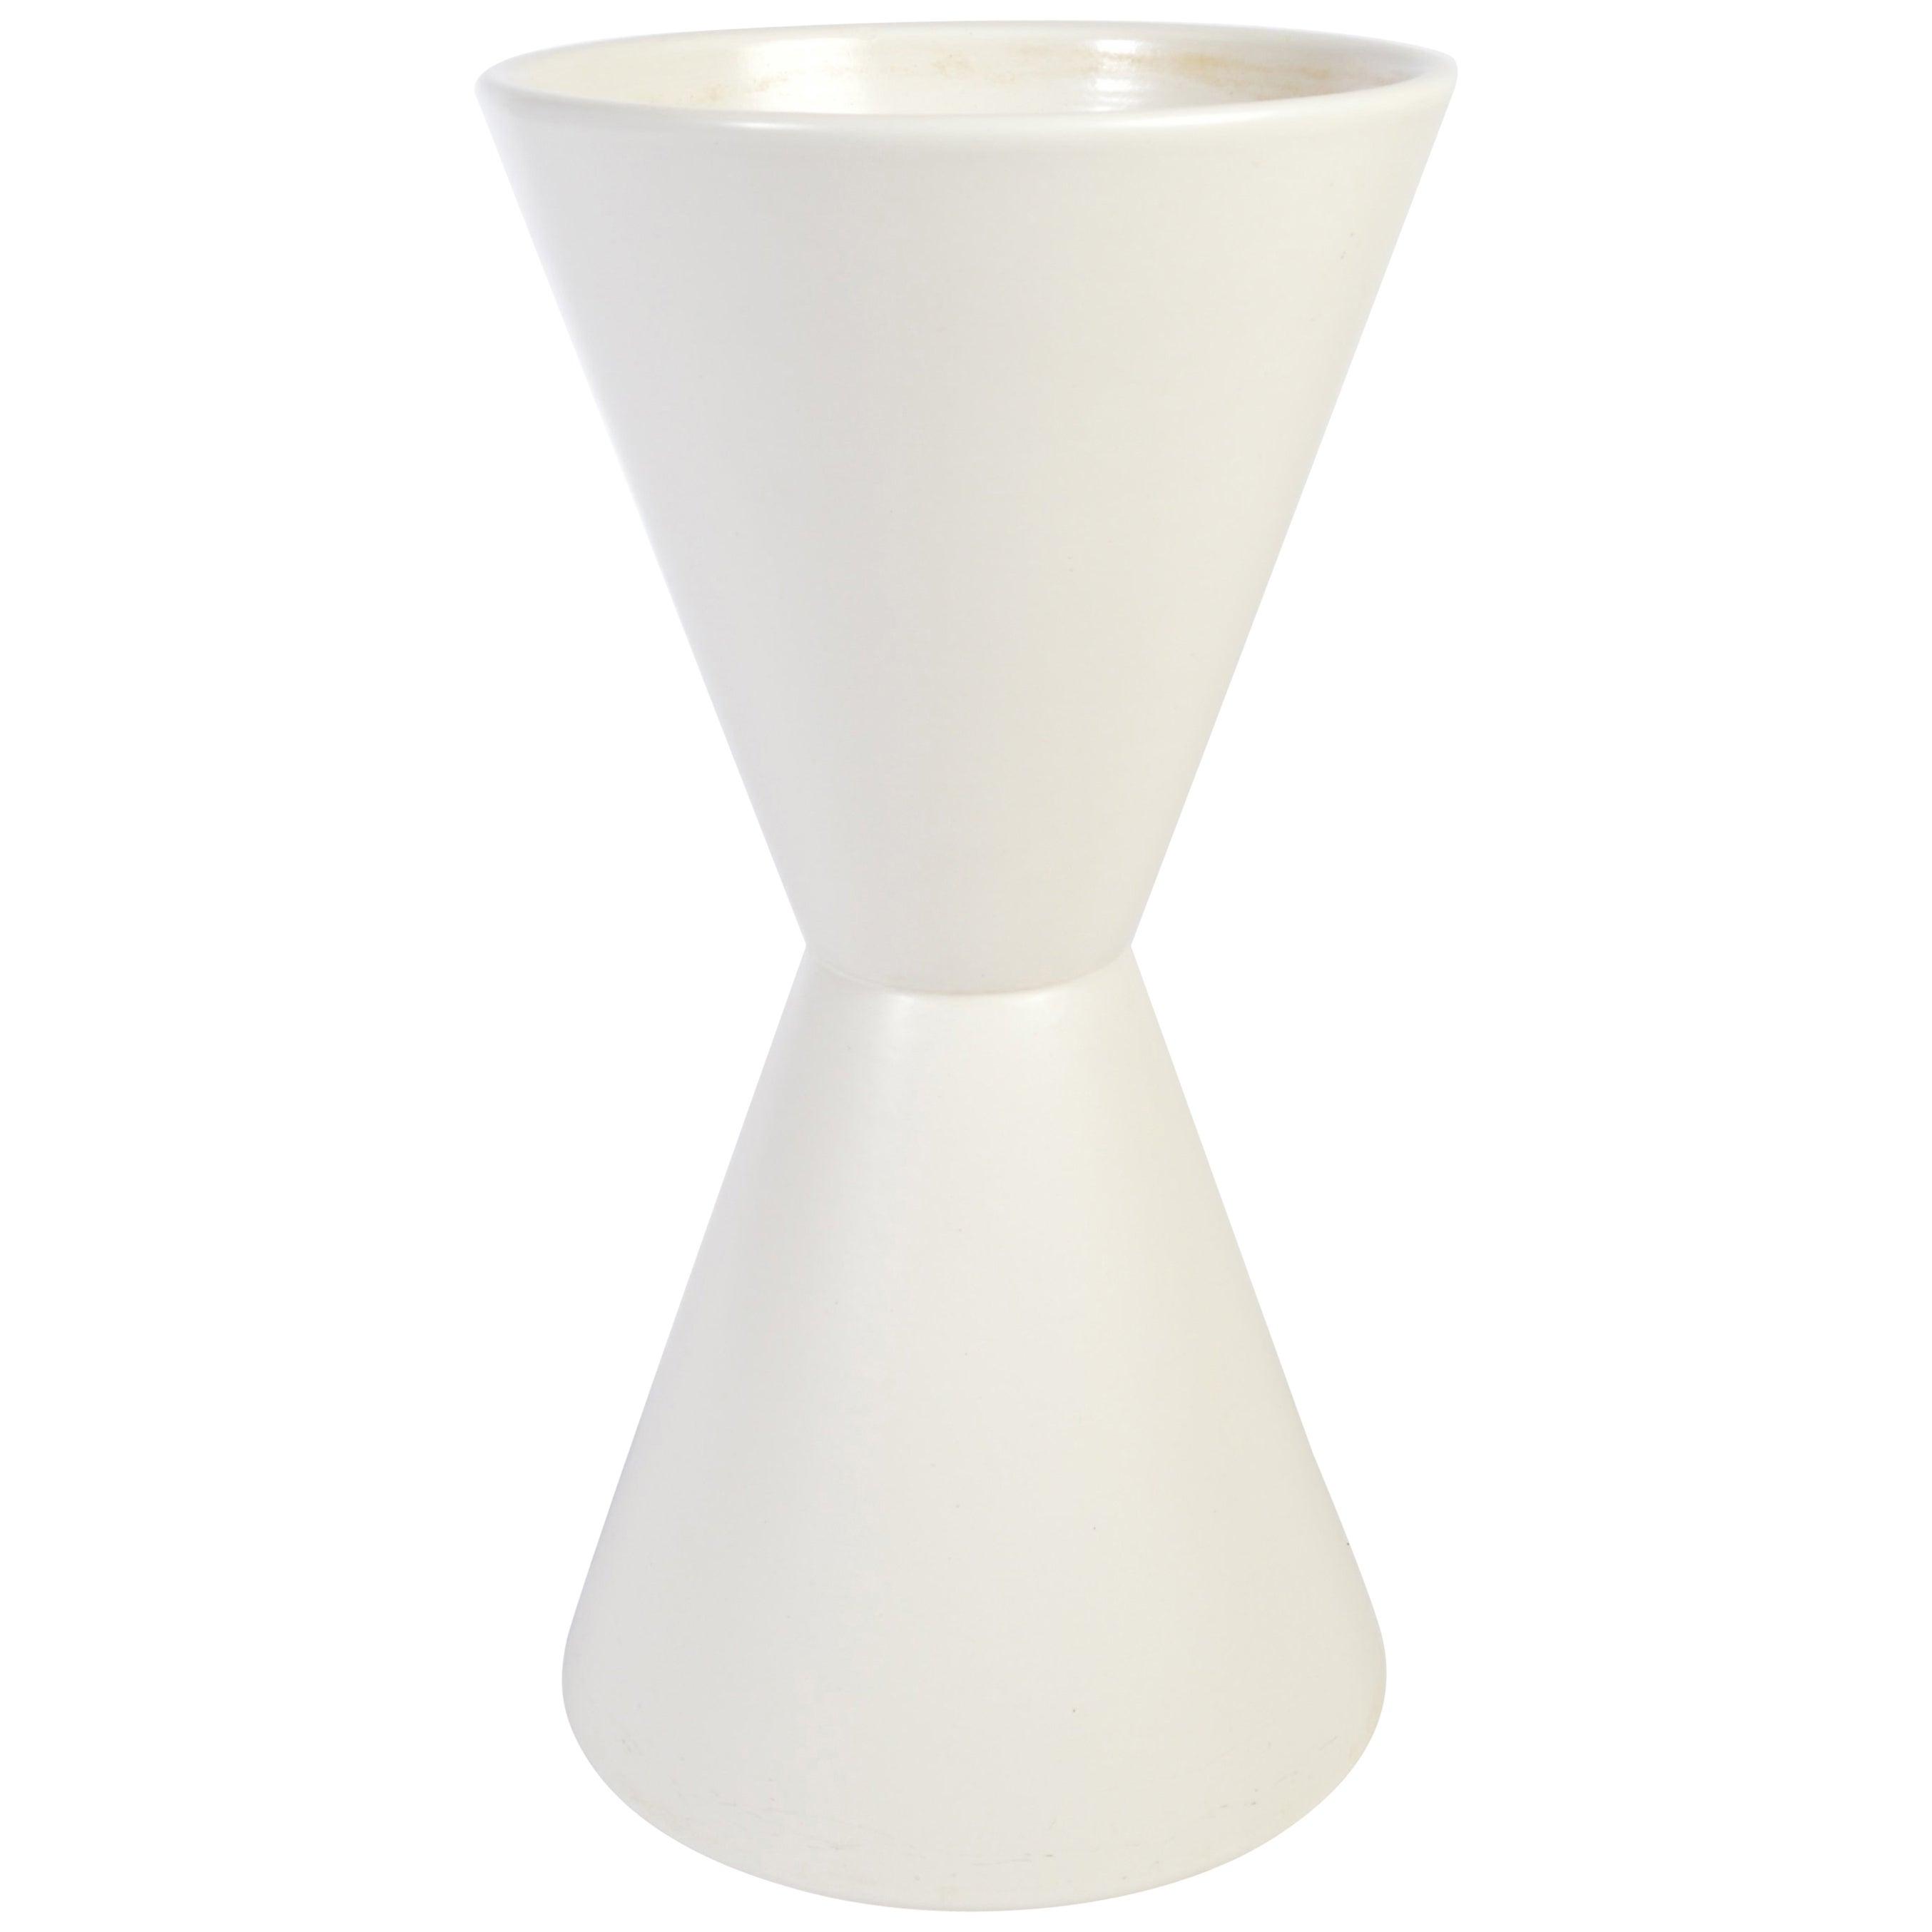 Lagardo Tackett for Architectural Pottery Double Cone Ceramic Pottery Planter